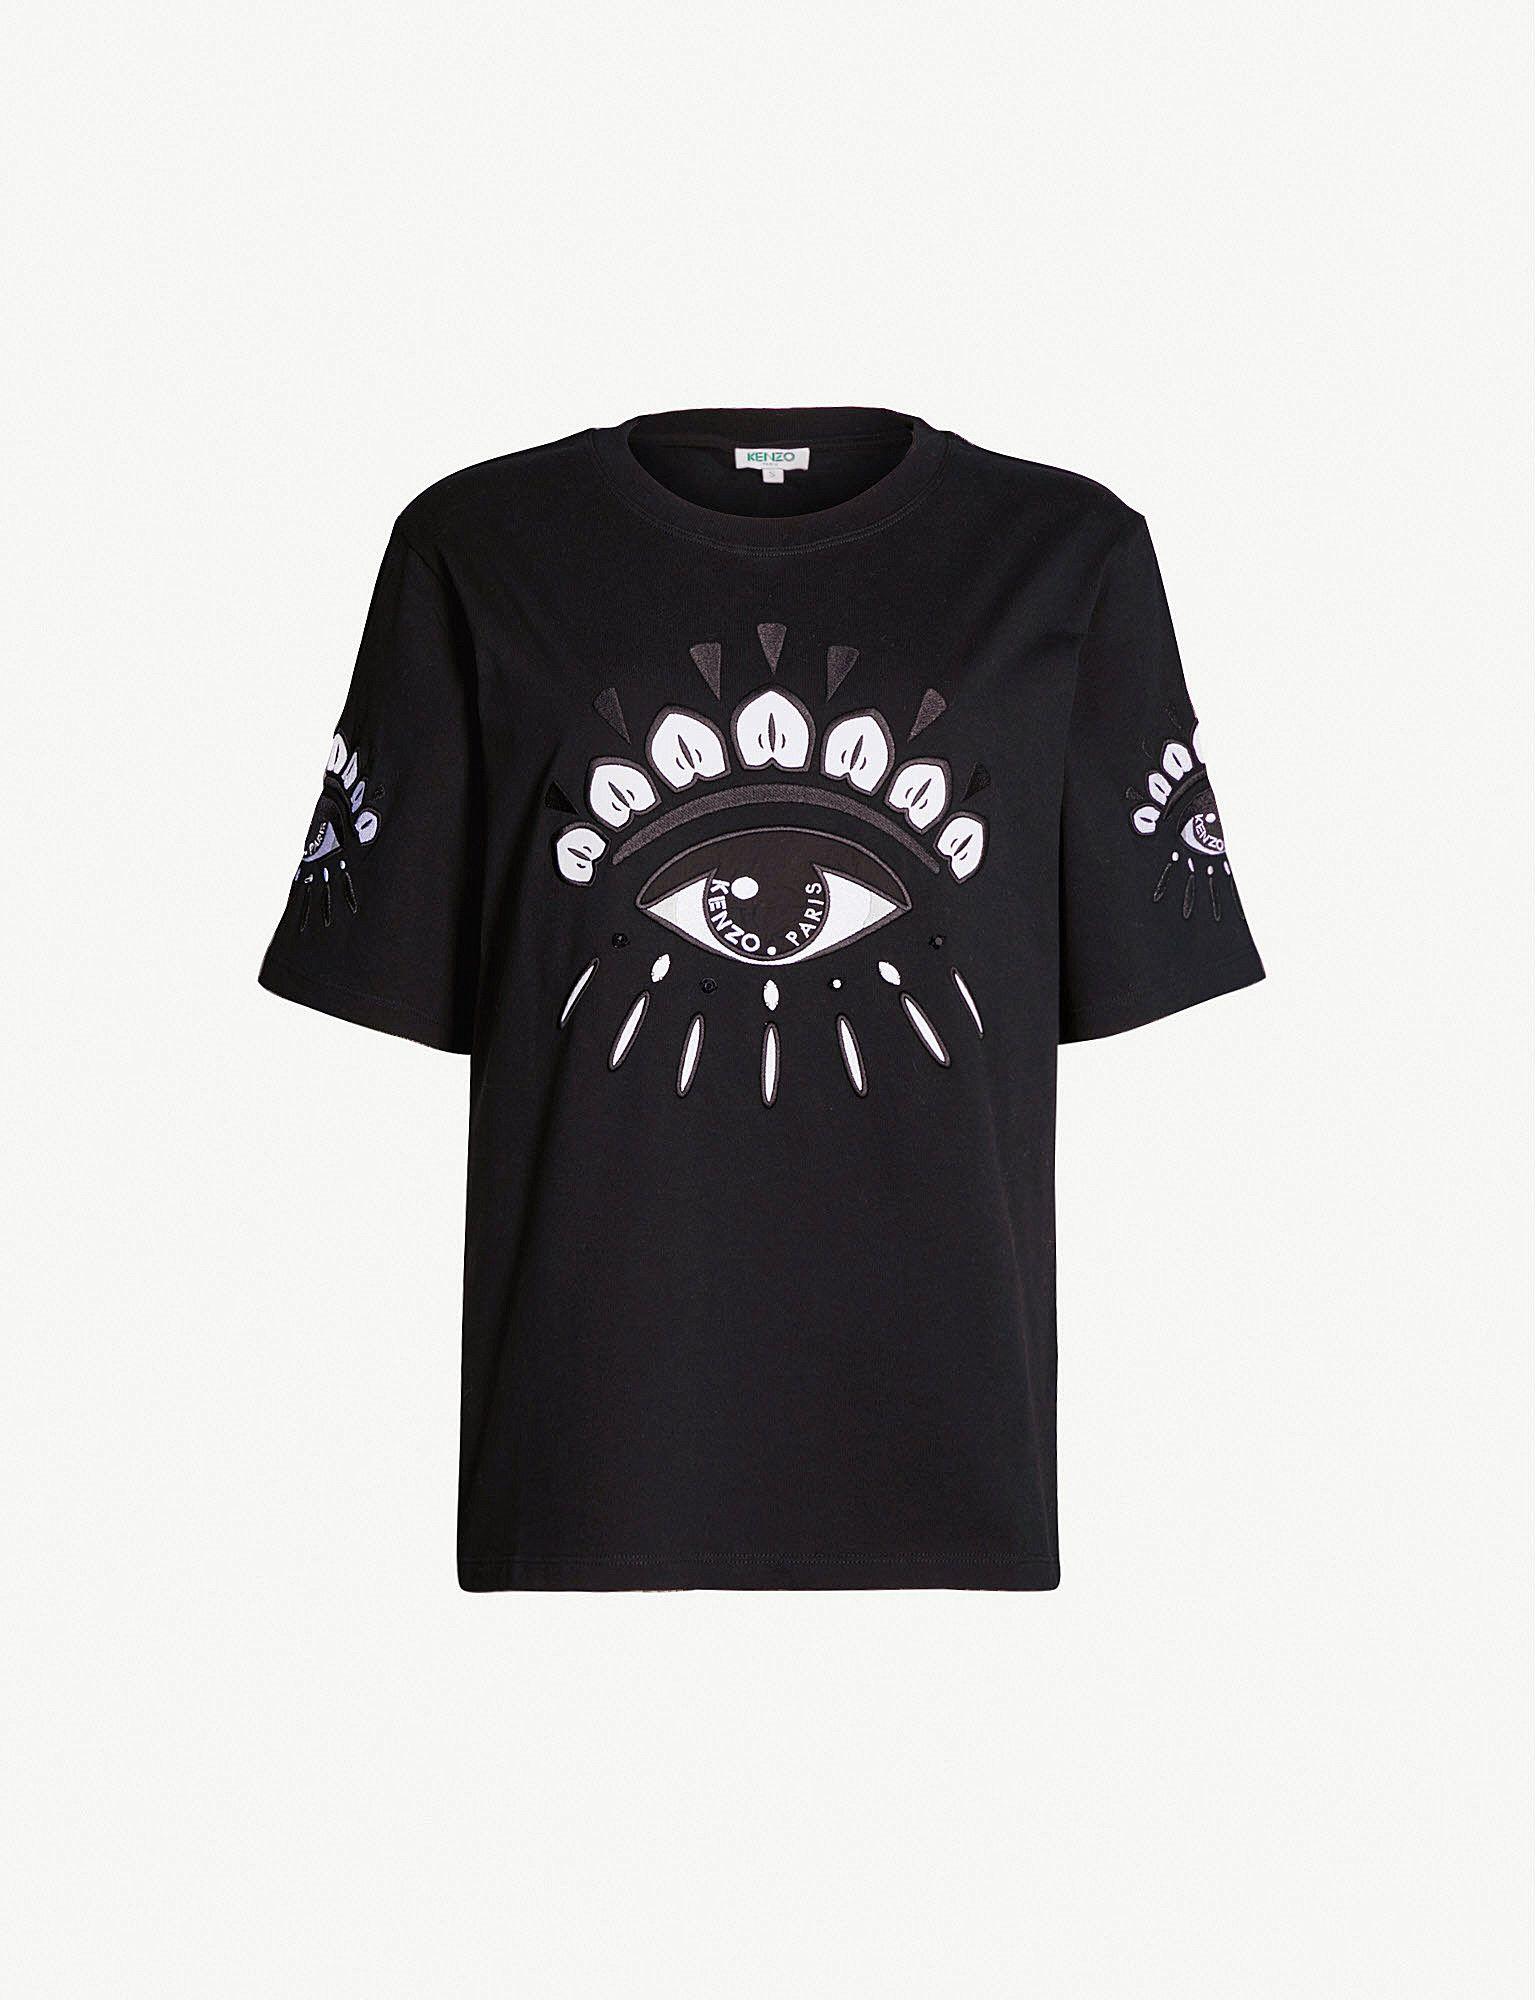 Shirt Kenzo Cotton In Slogan T Jersey 2019Graphic Eye HIDW9YE2